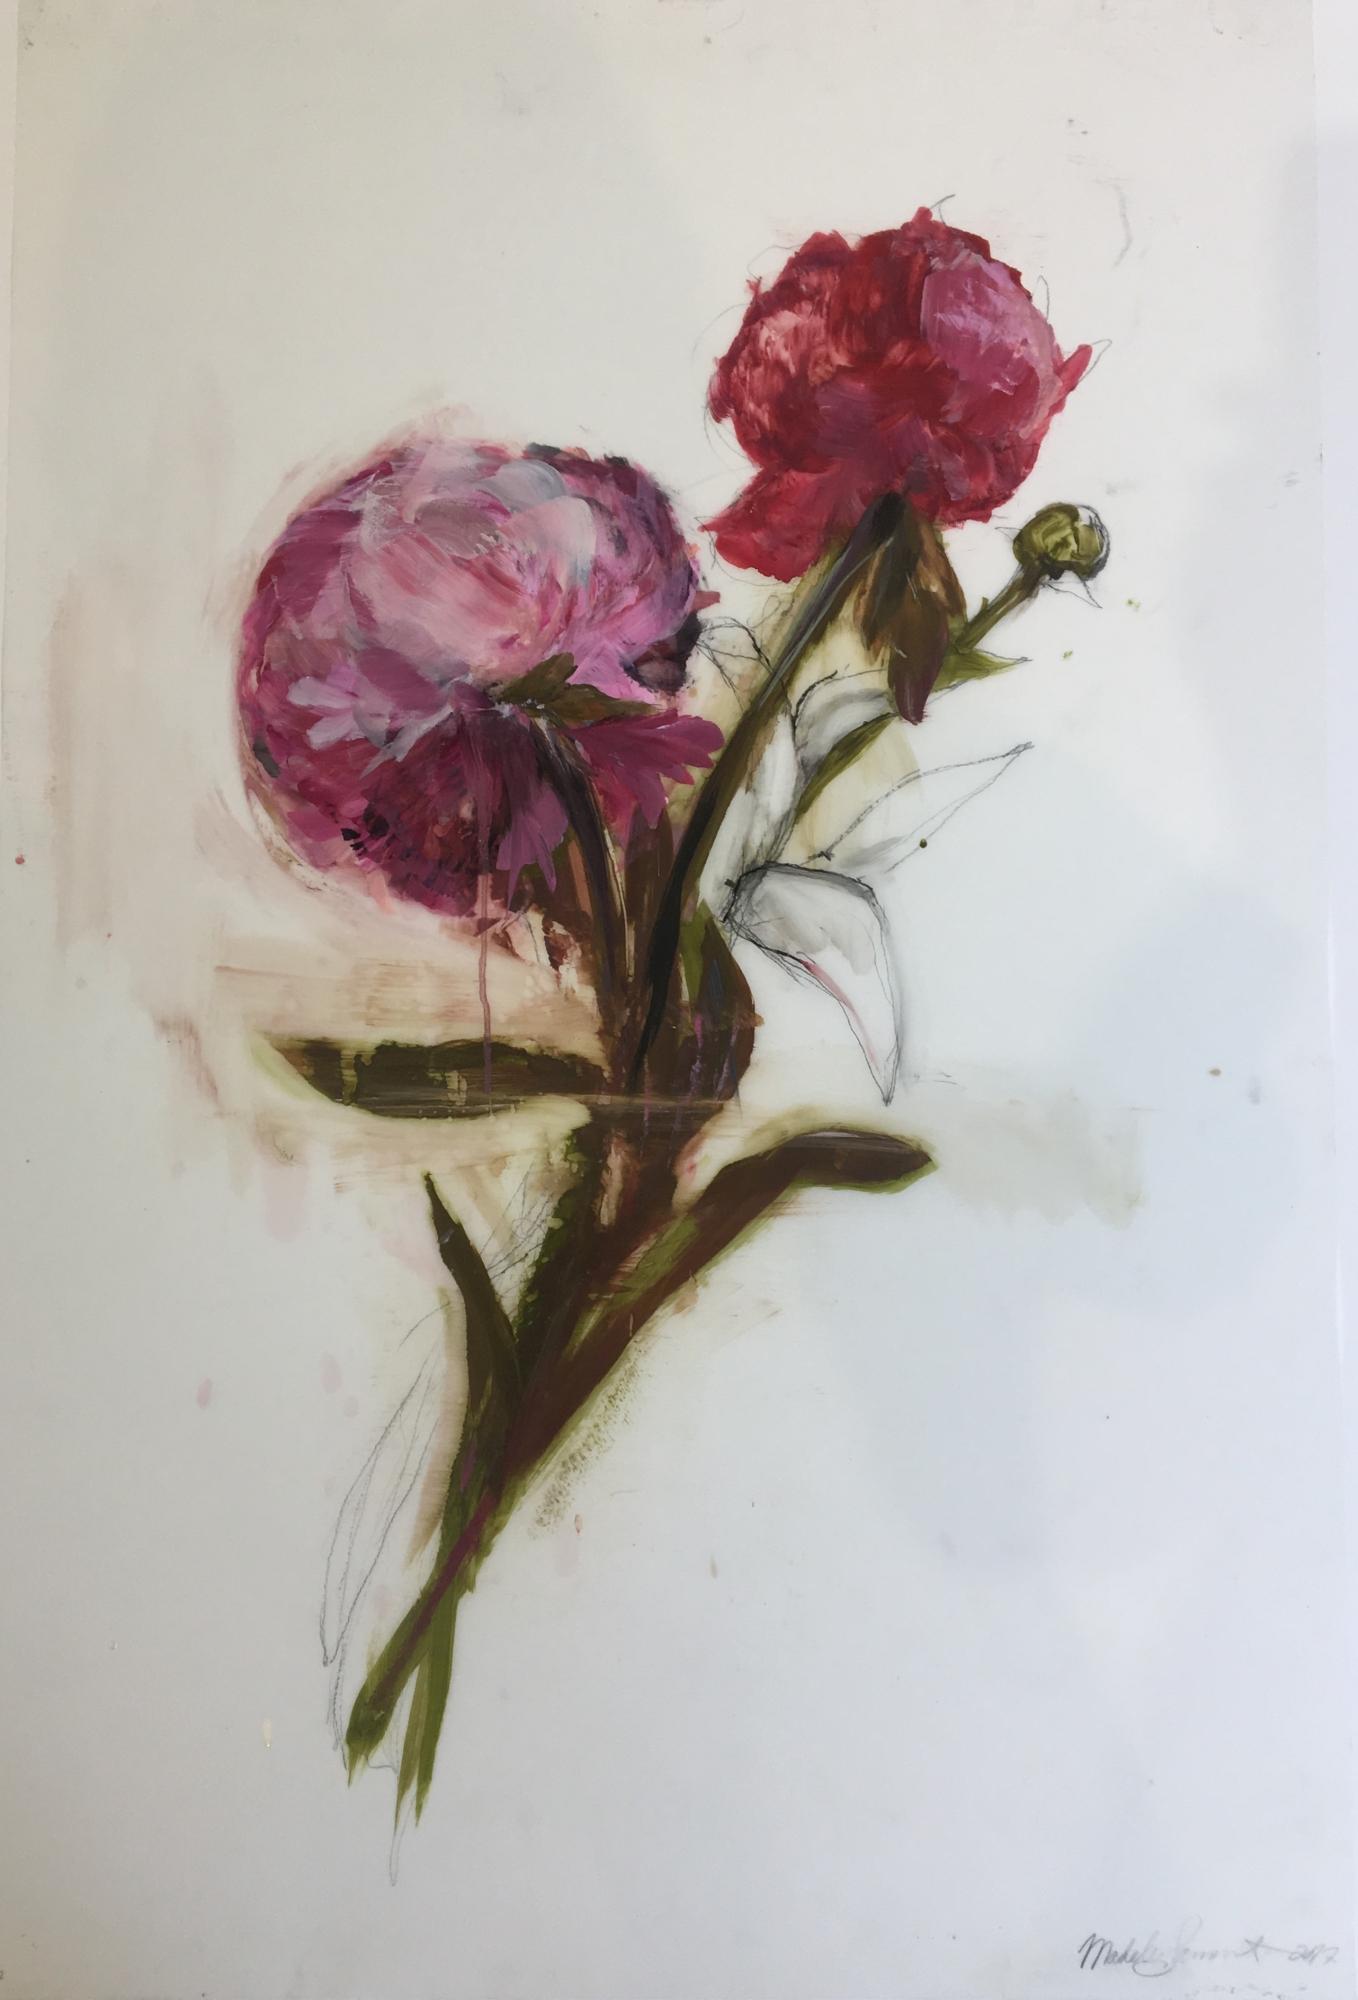 Pink Peony 2017  by Madeleine Lamont